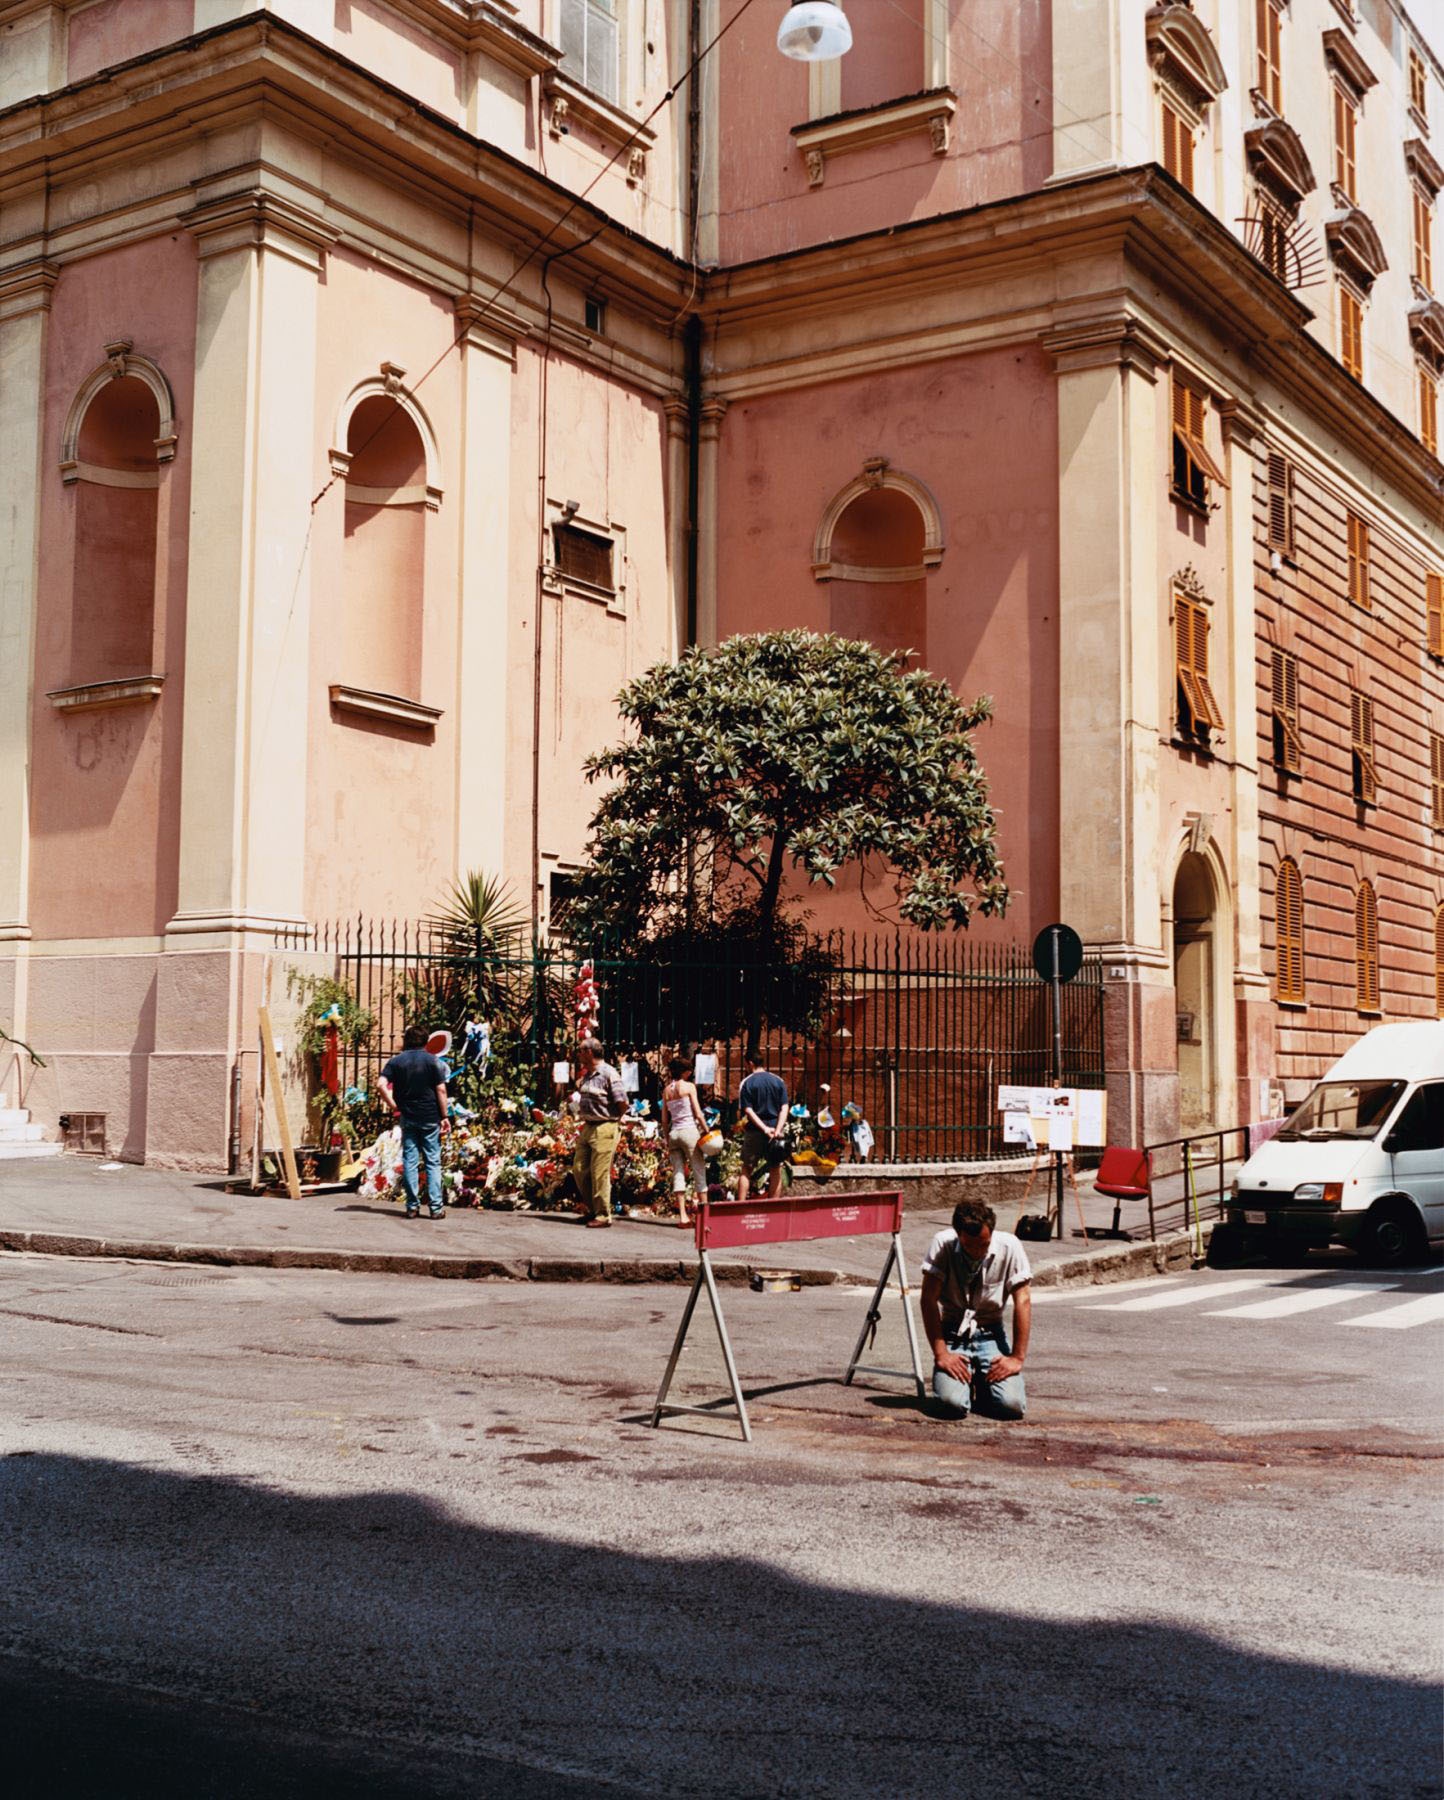 A man kneeling at the spot where Carlo Giuliani lost his life, Piazza Alimonda, Genoa, 21 July 2001